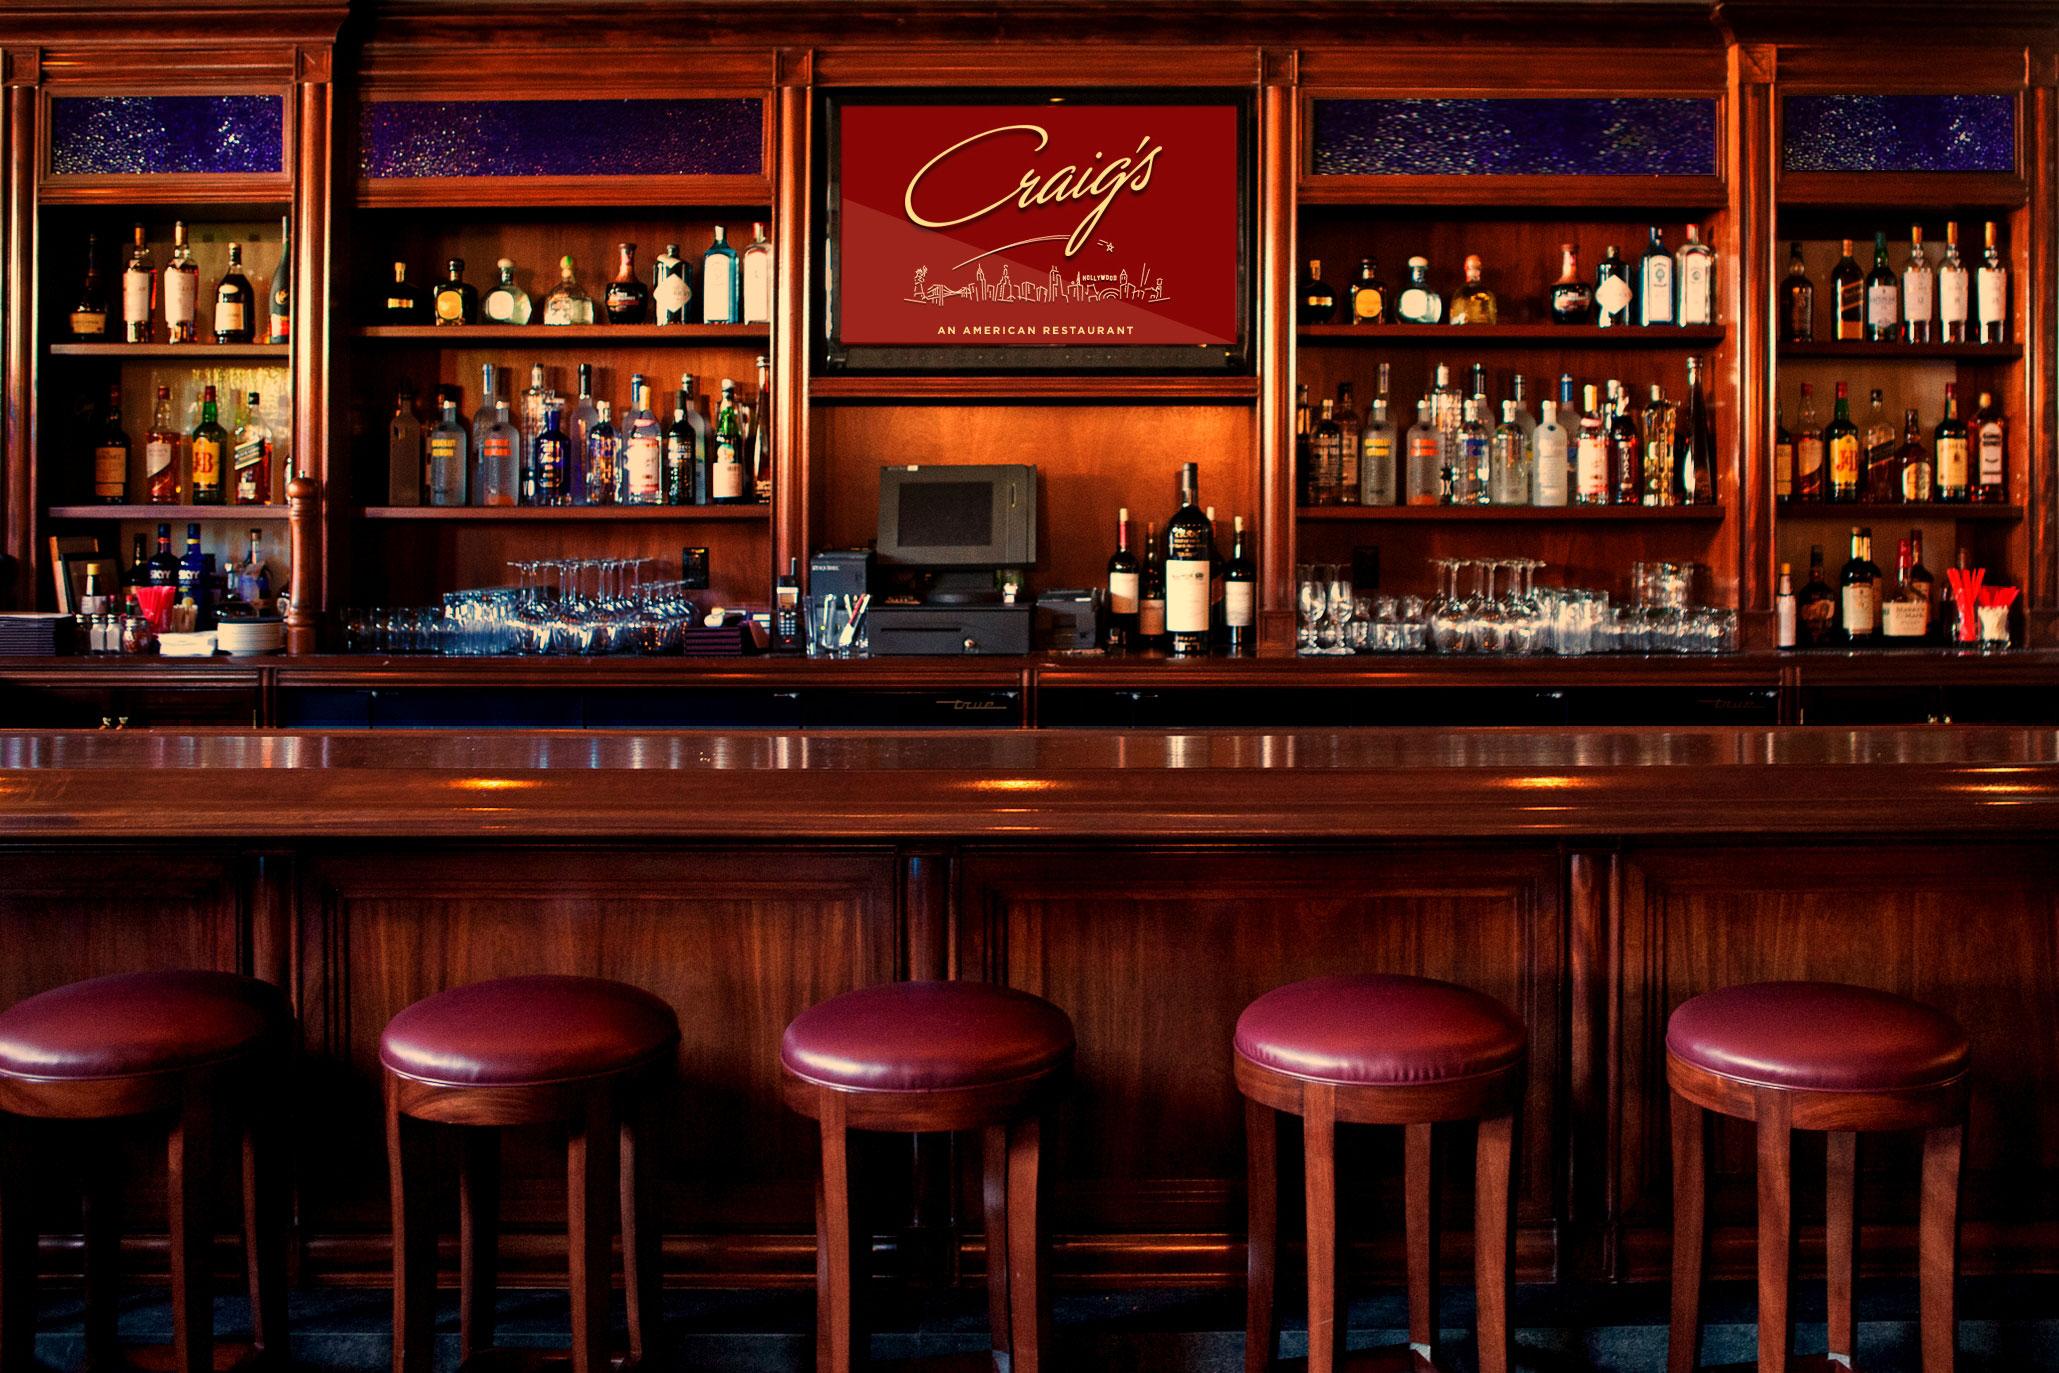 Craig's Restaurant West Hollywood Los Angeles CA Reviews ...